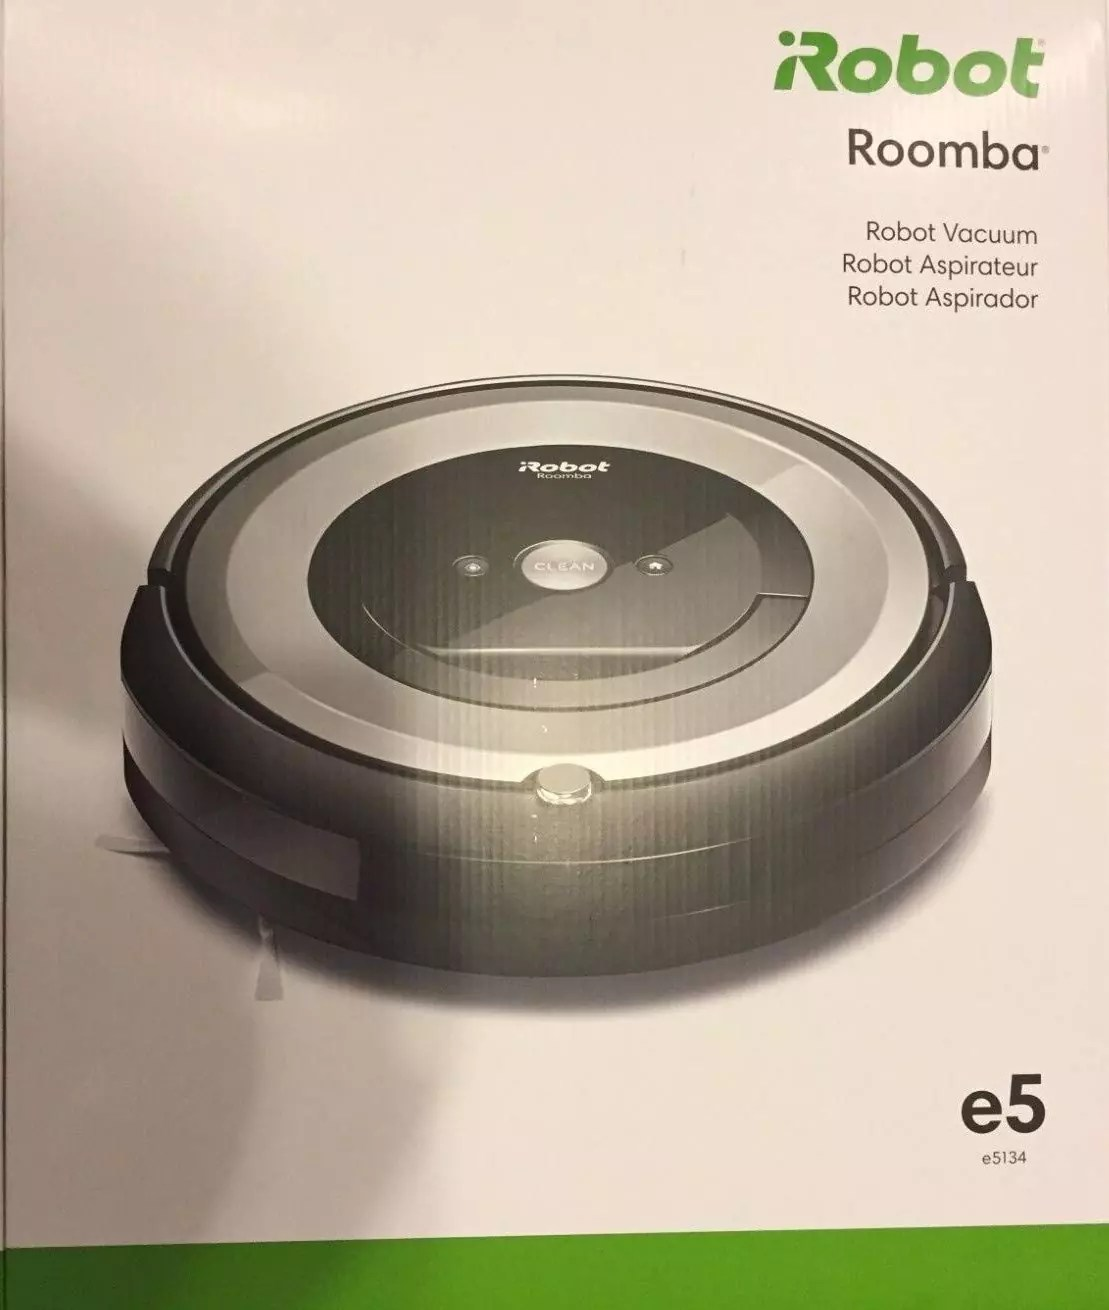 iRobot Roomba e5 5134